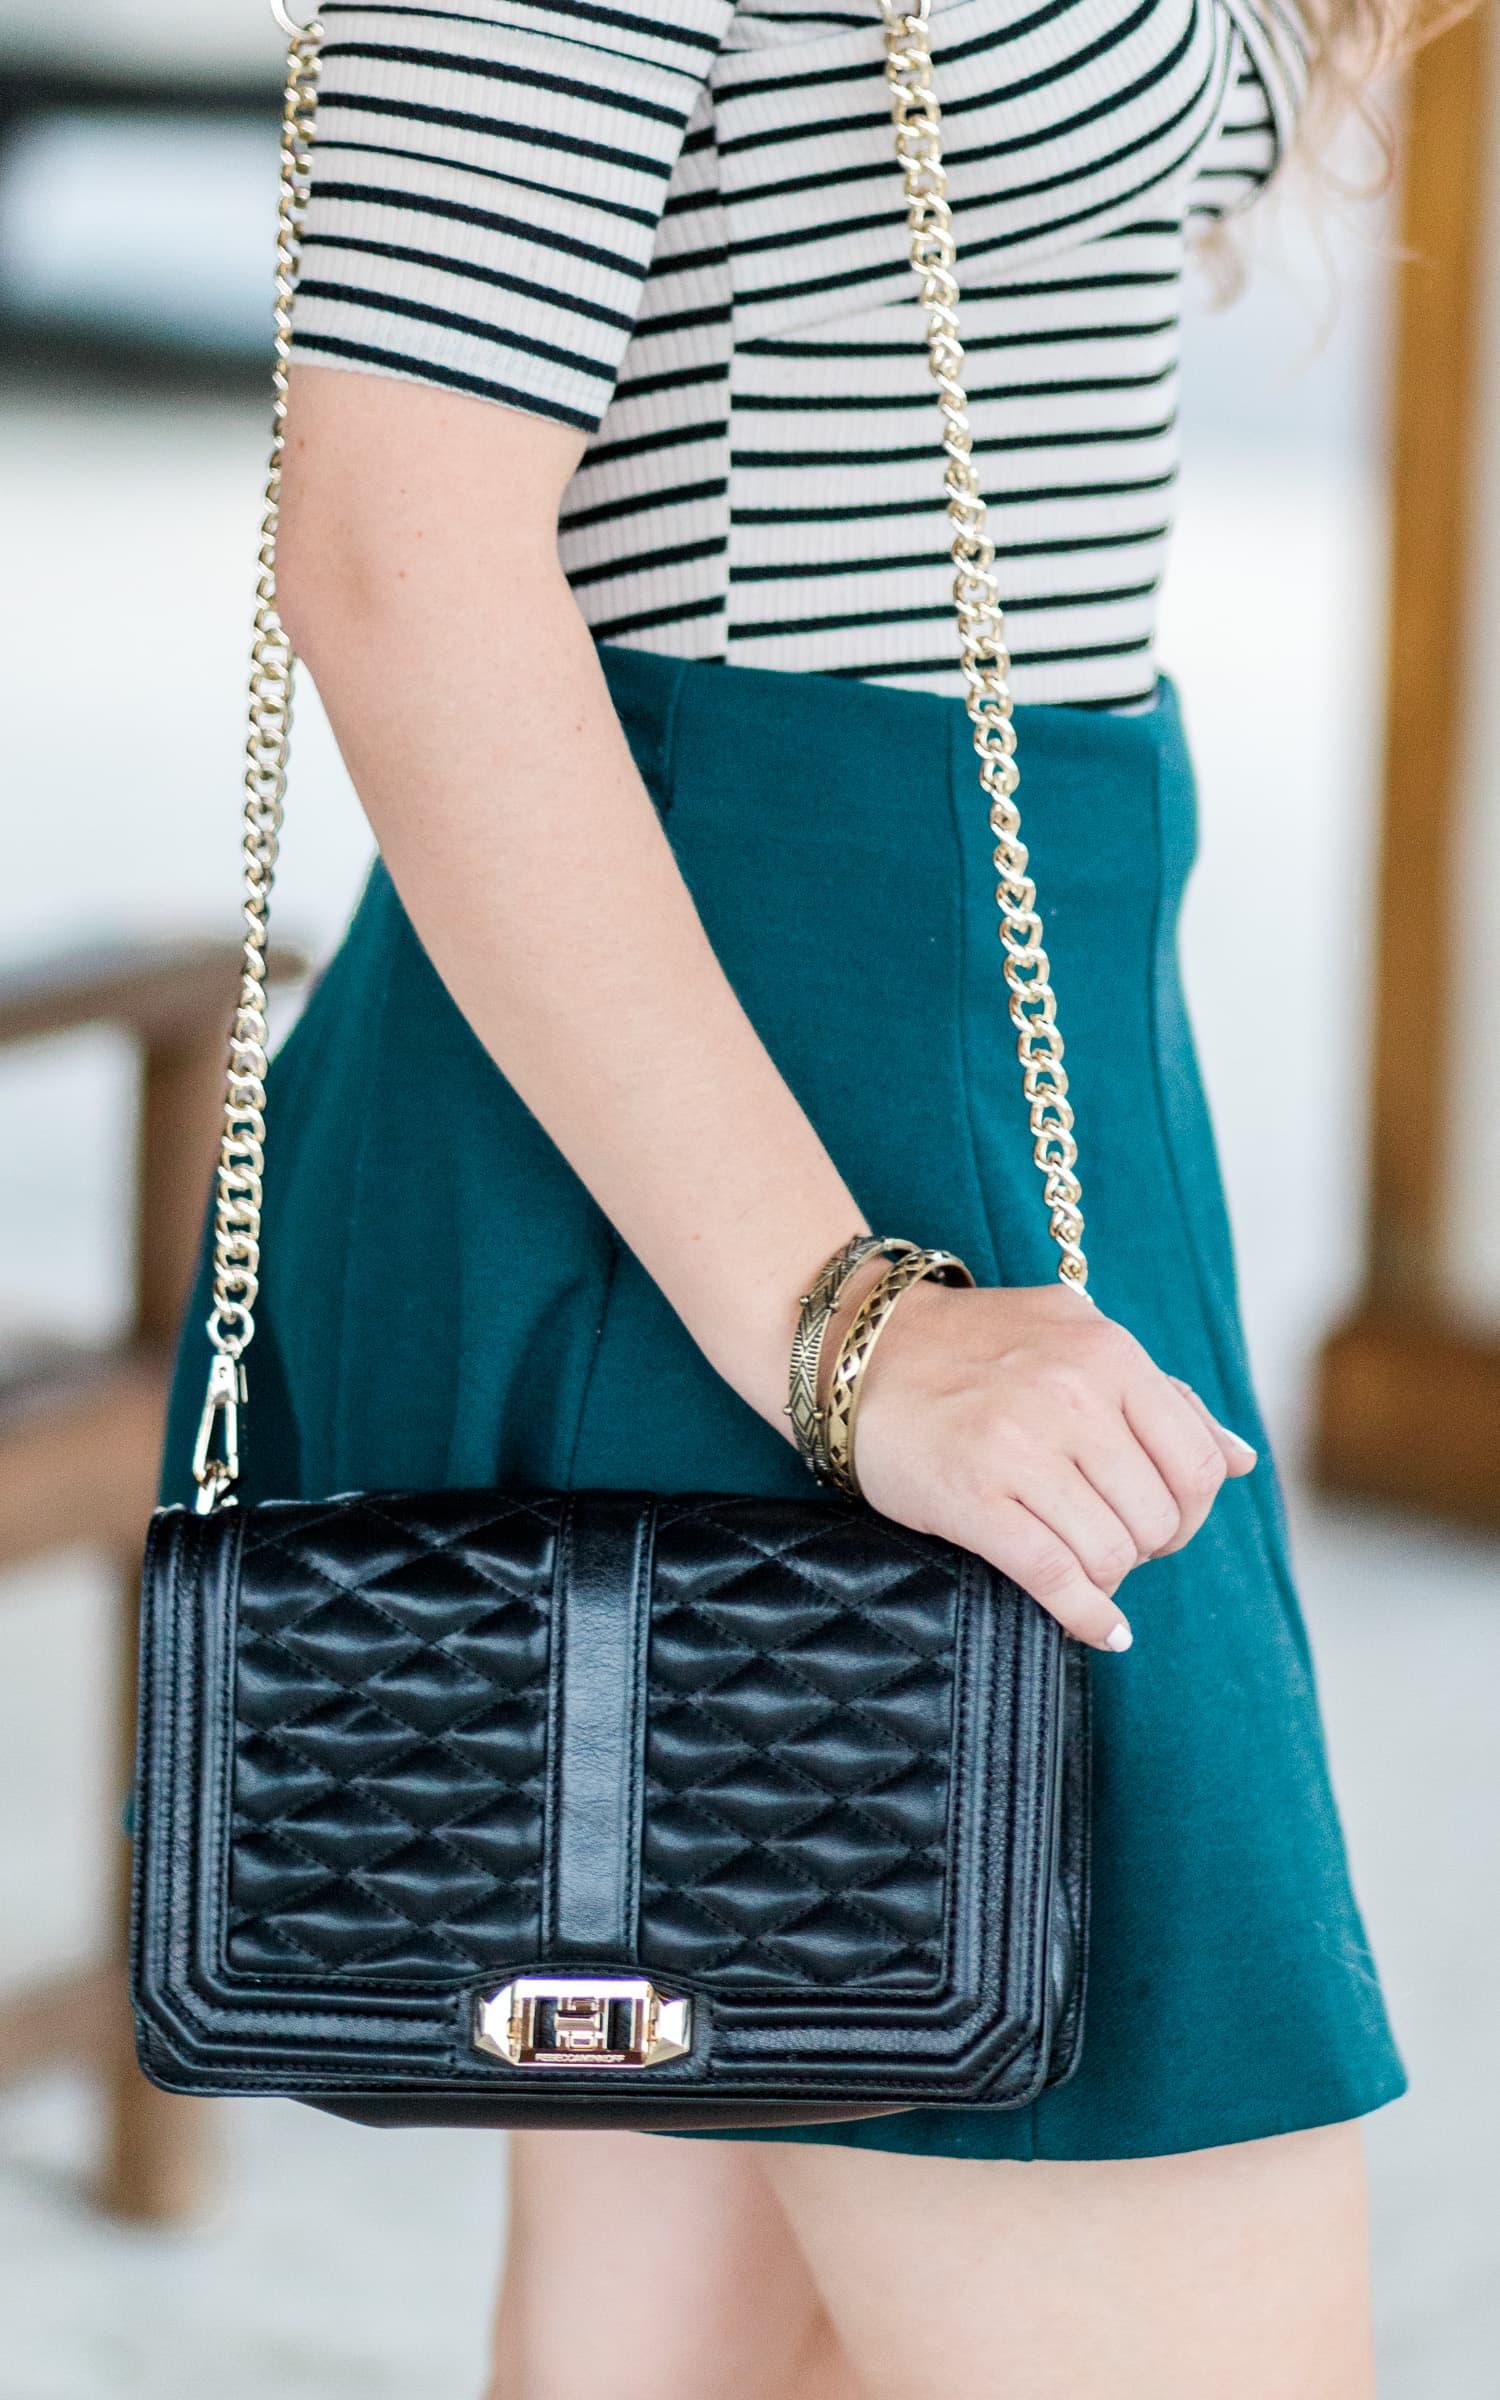 Rebecca Minkoff black and gold Love crossbody bag, antiqued gold bracelets, and a hunter green skater skirt